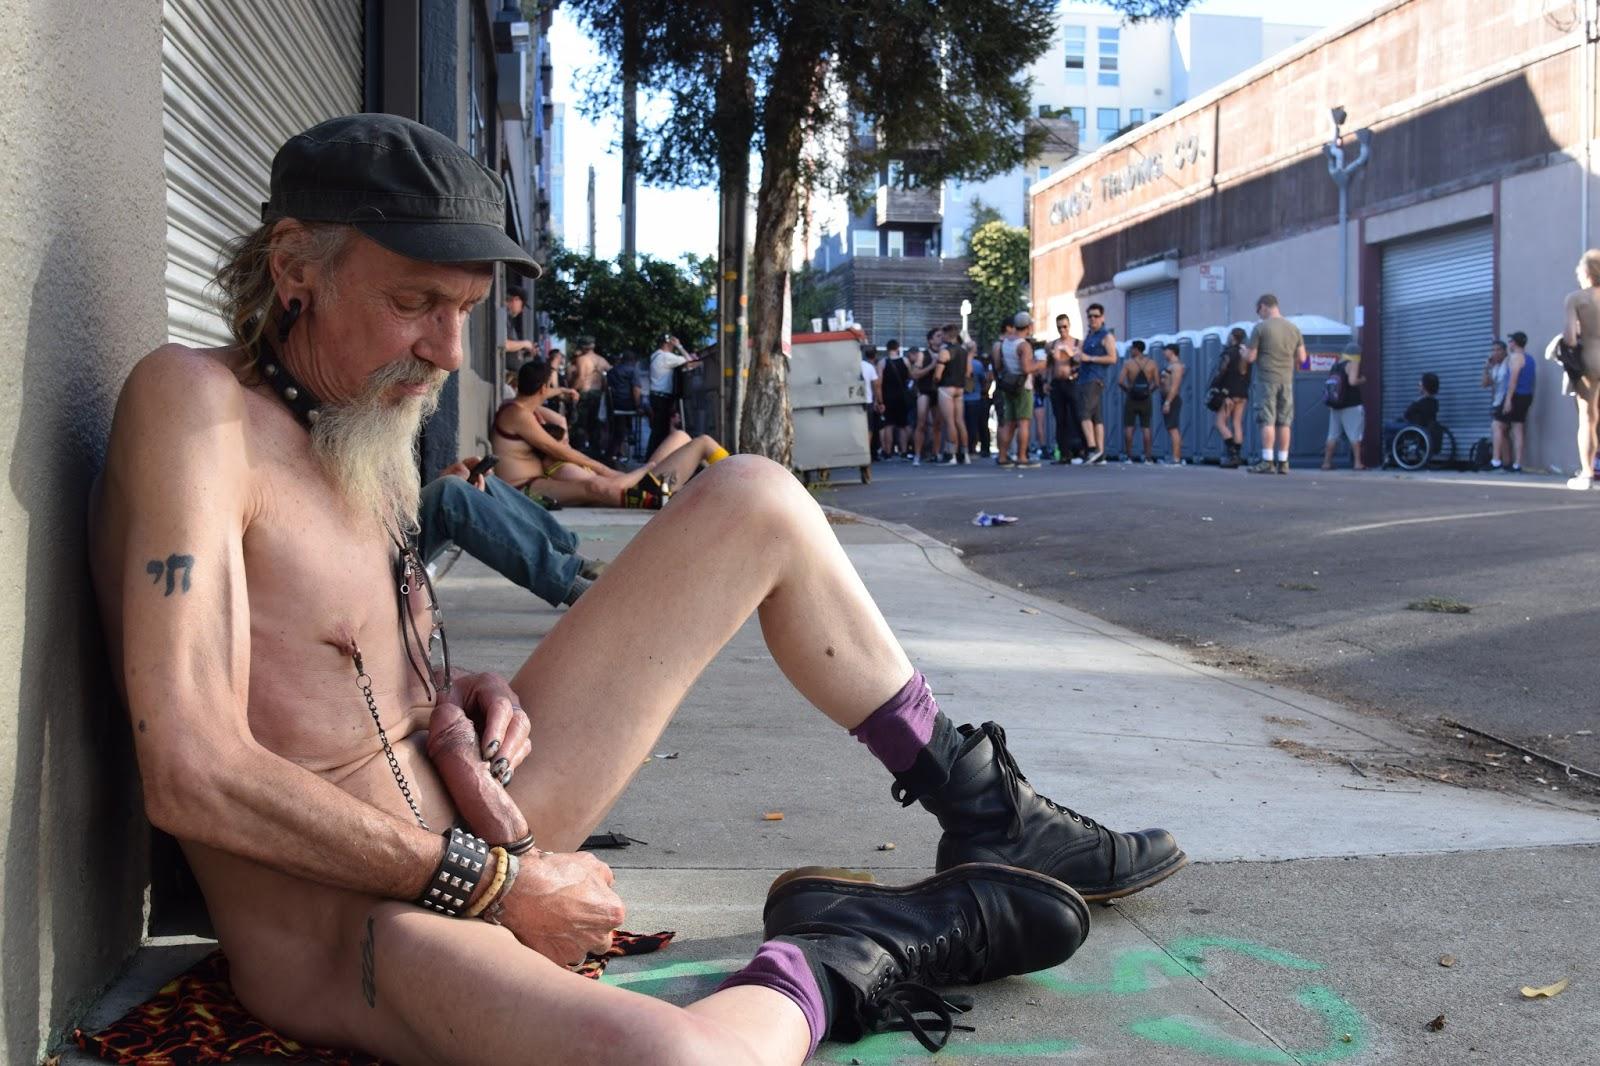 Guy masturbating in public